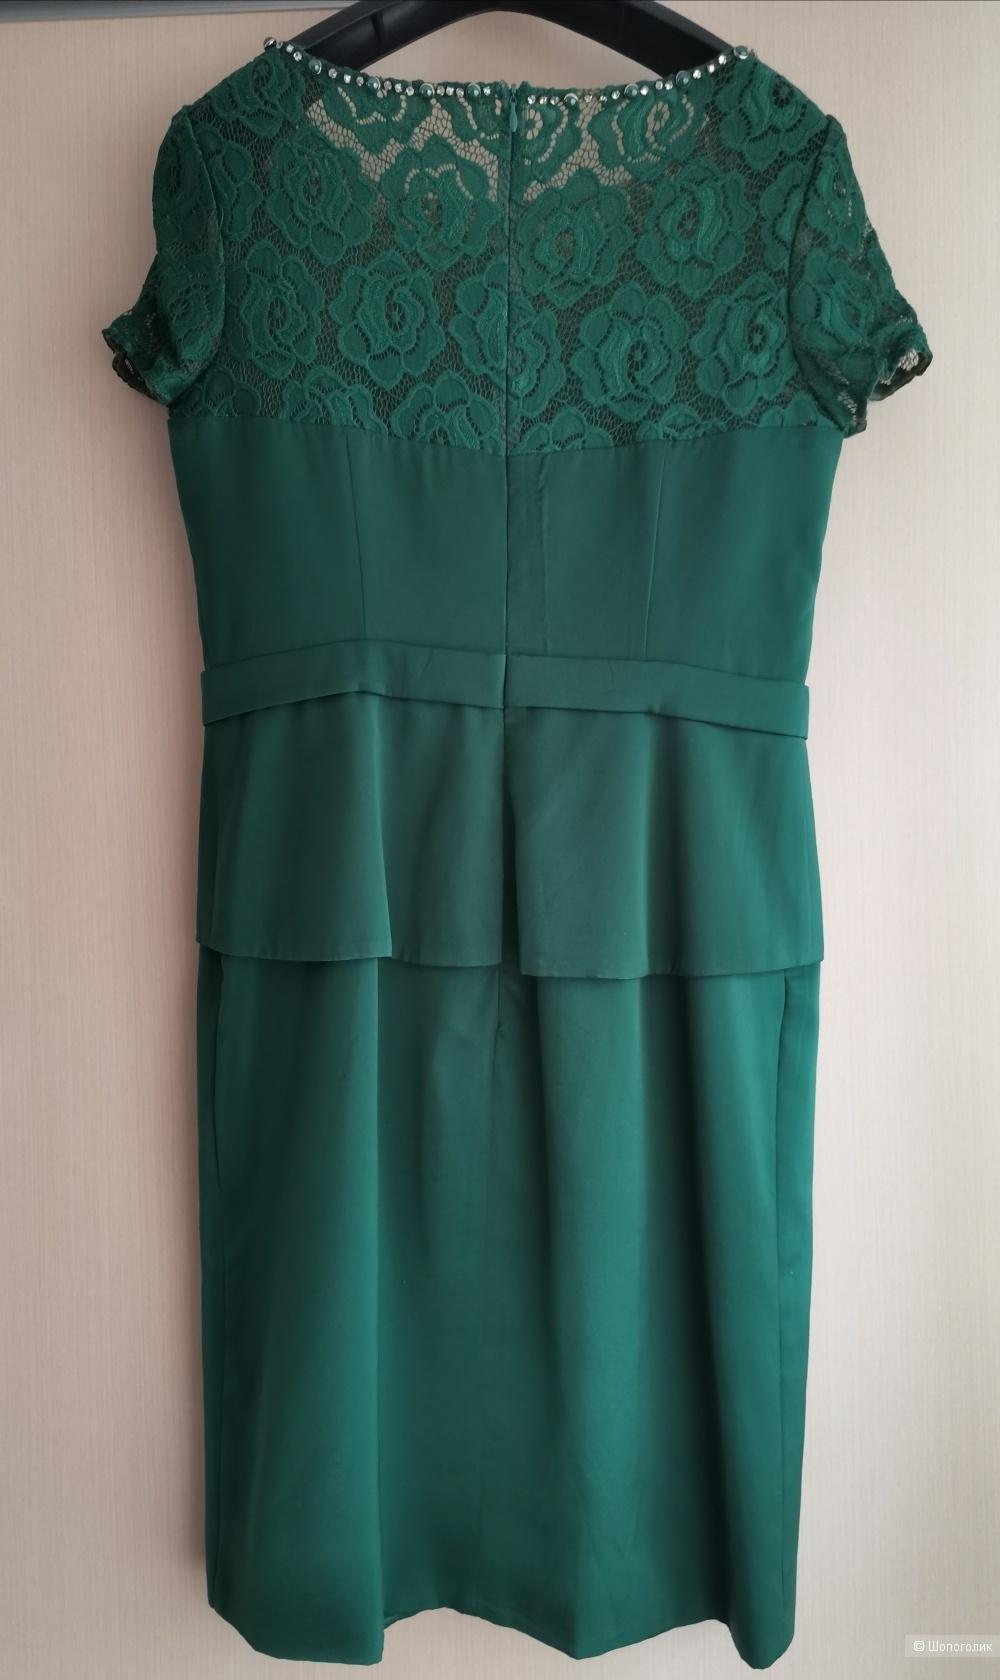 Платье edressit 46-48 размера